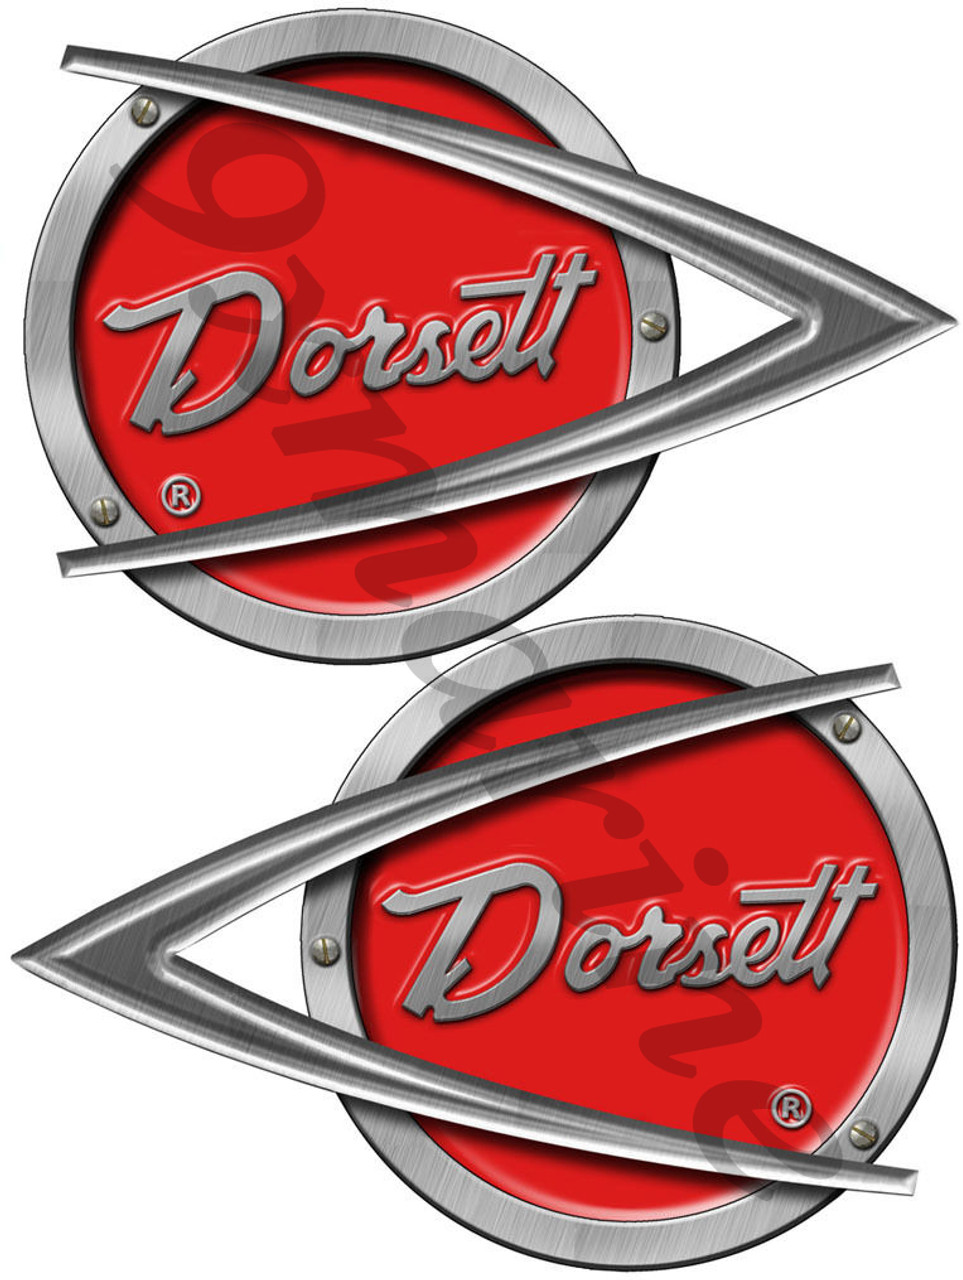 Two Dorsett Vintage Stickers Vinyl Replica